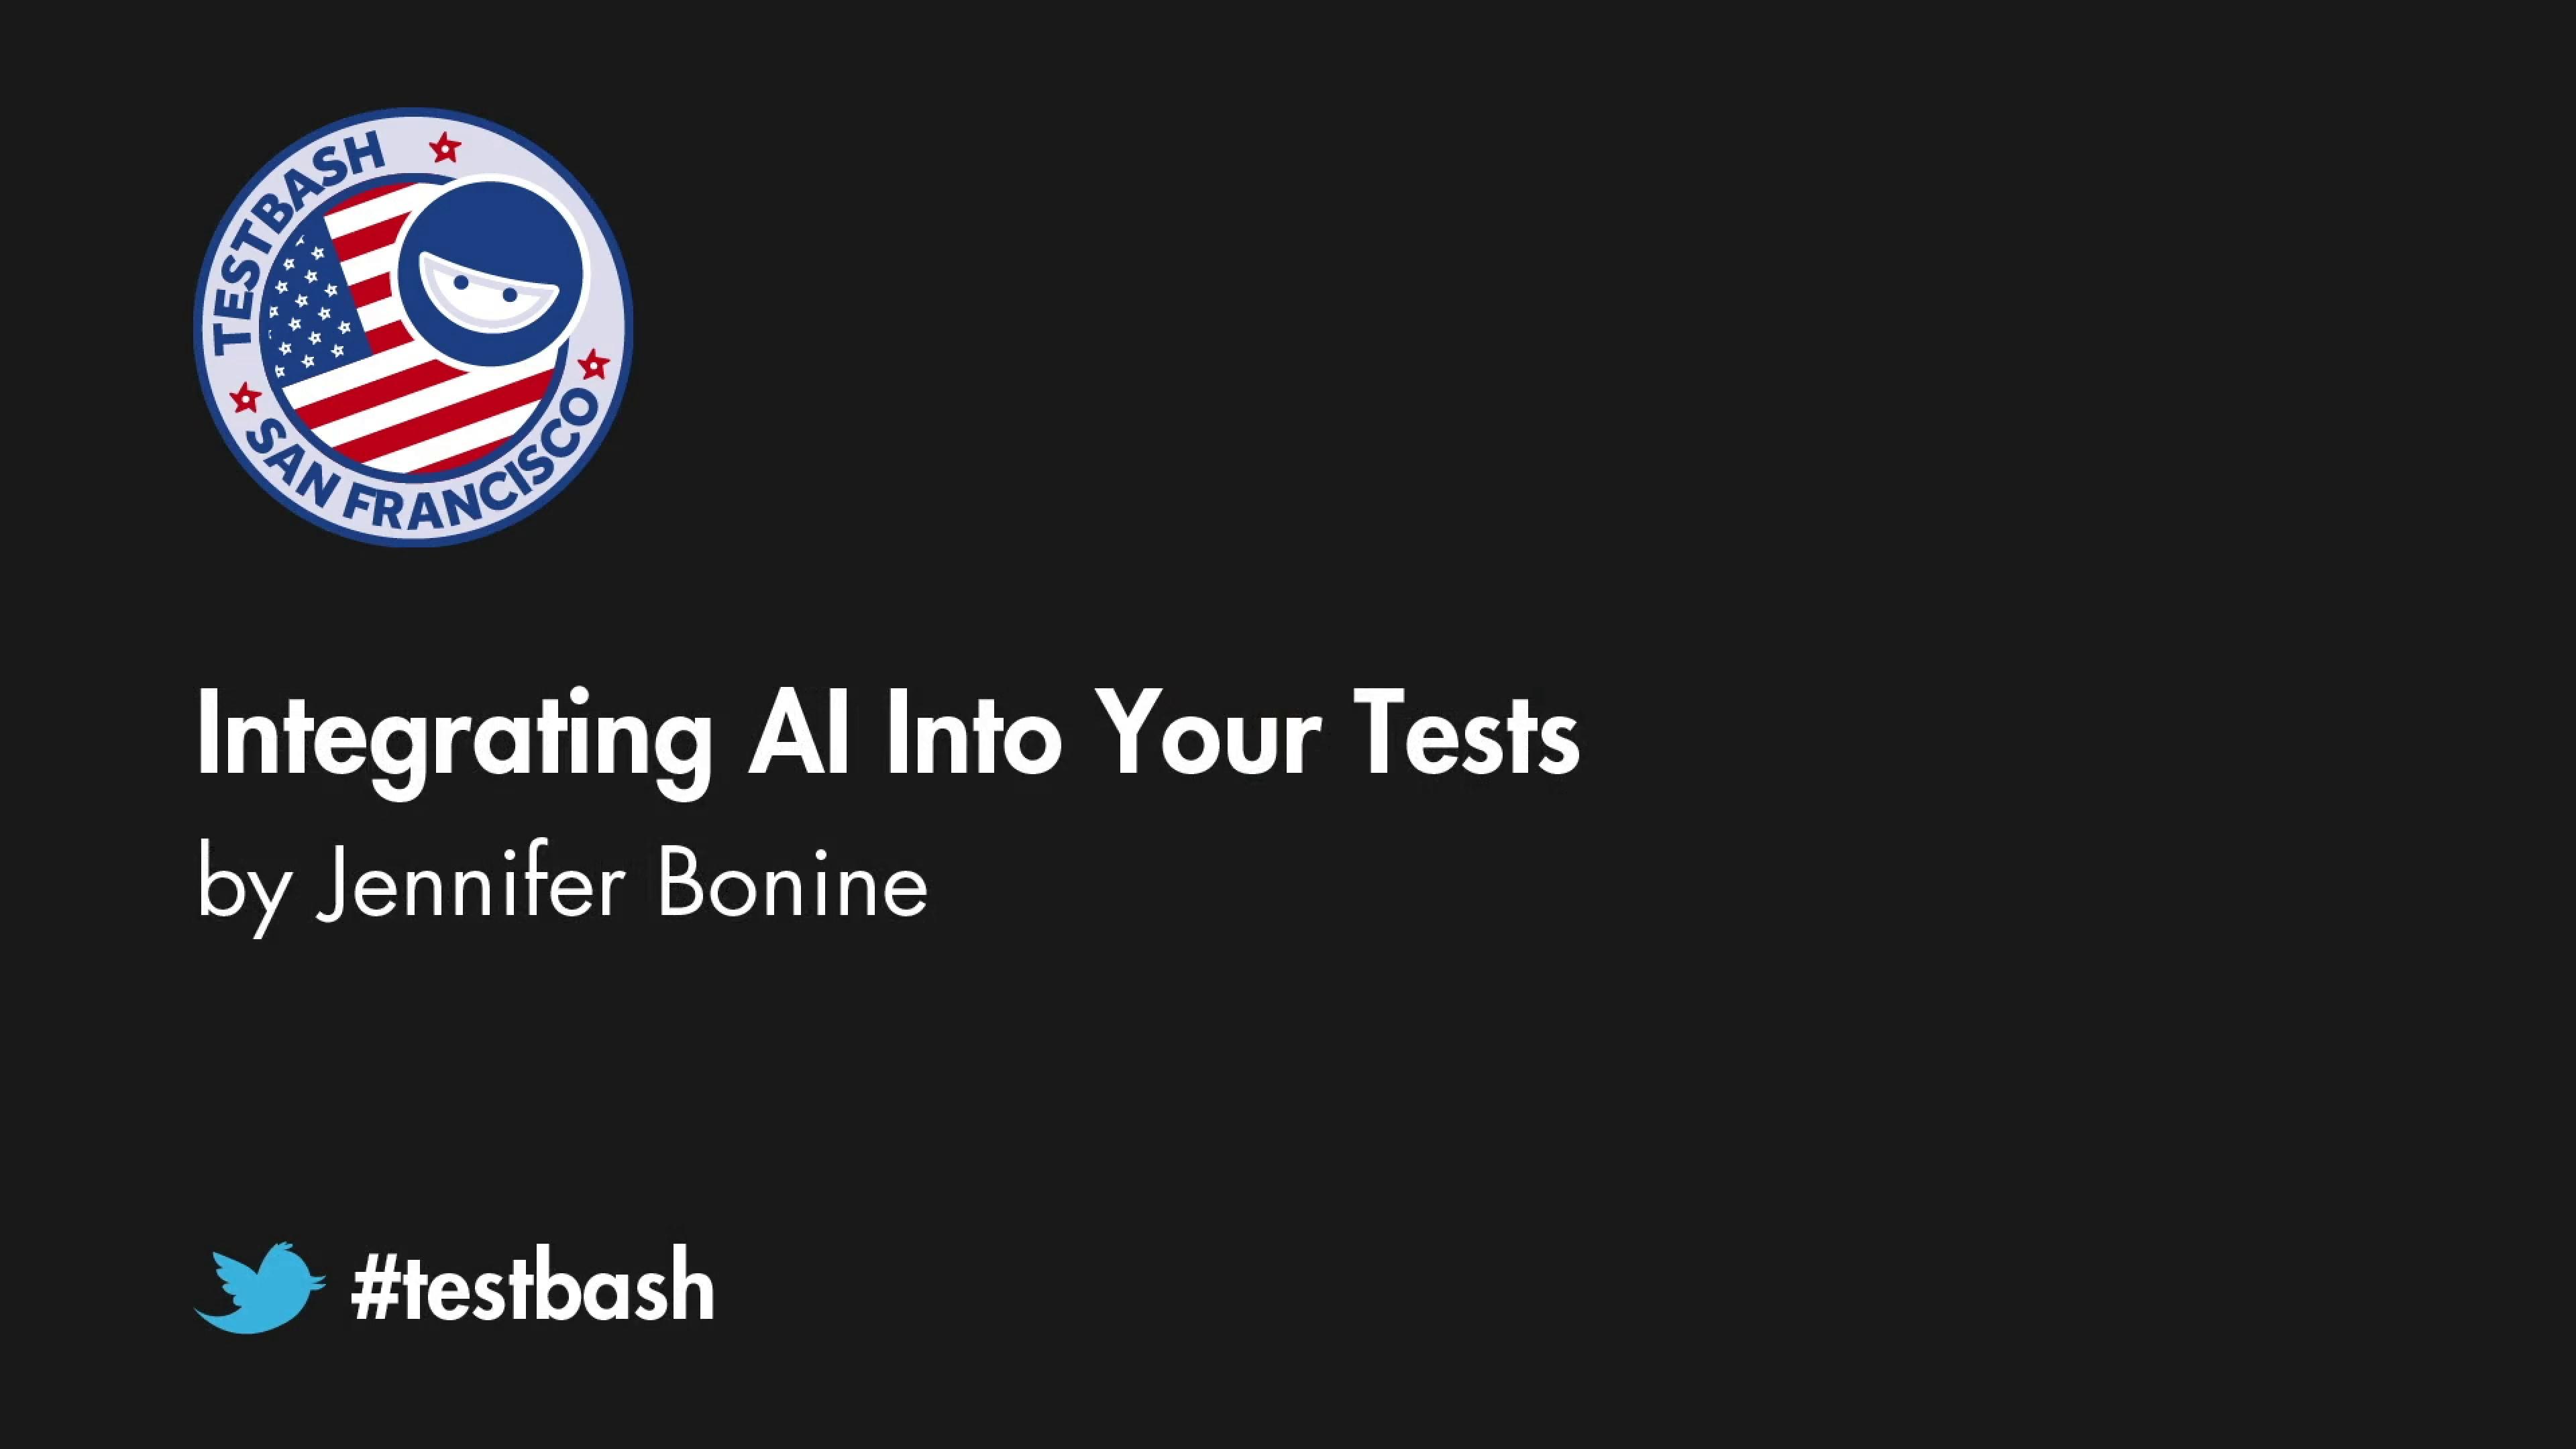 Integrating AI Into Your Tests - Jennifer Bonine